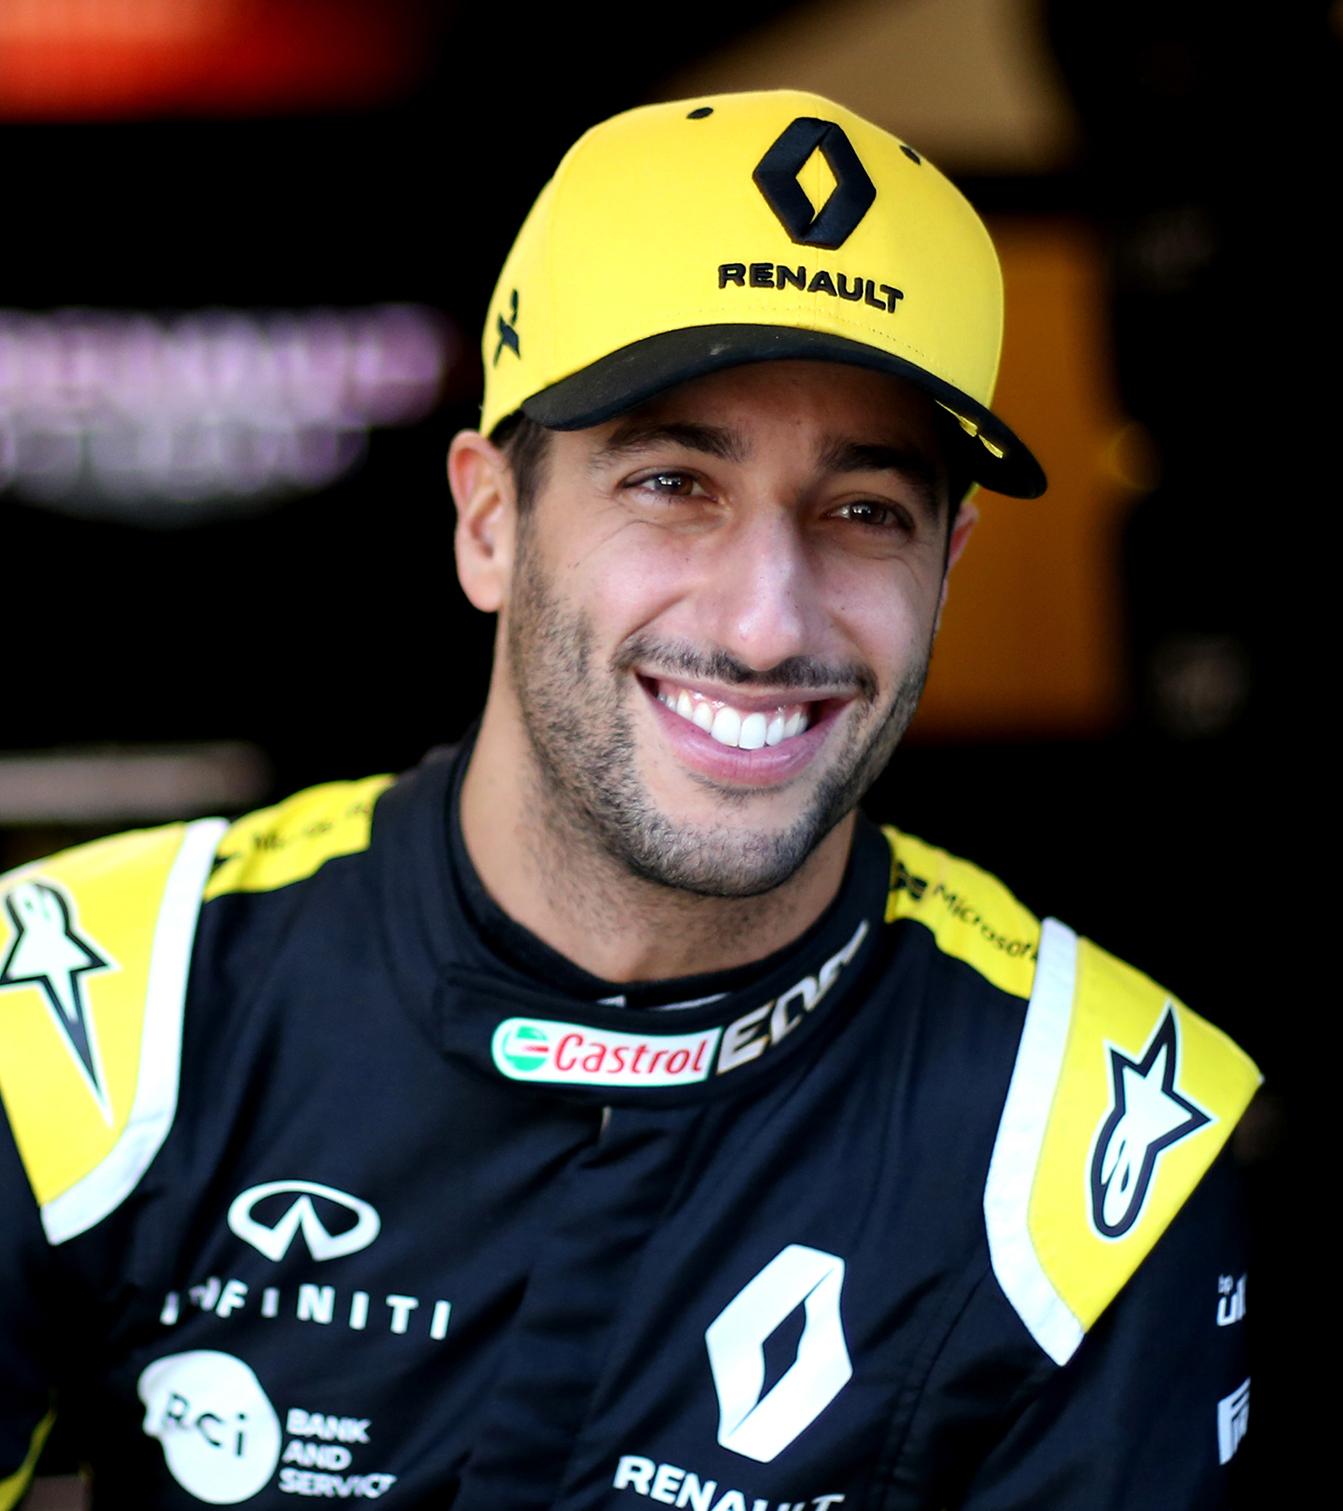 INFINITI and Renault F1? Team Driver Daniel Ricciardo